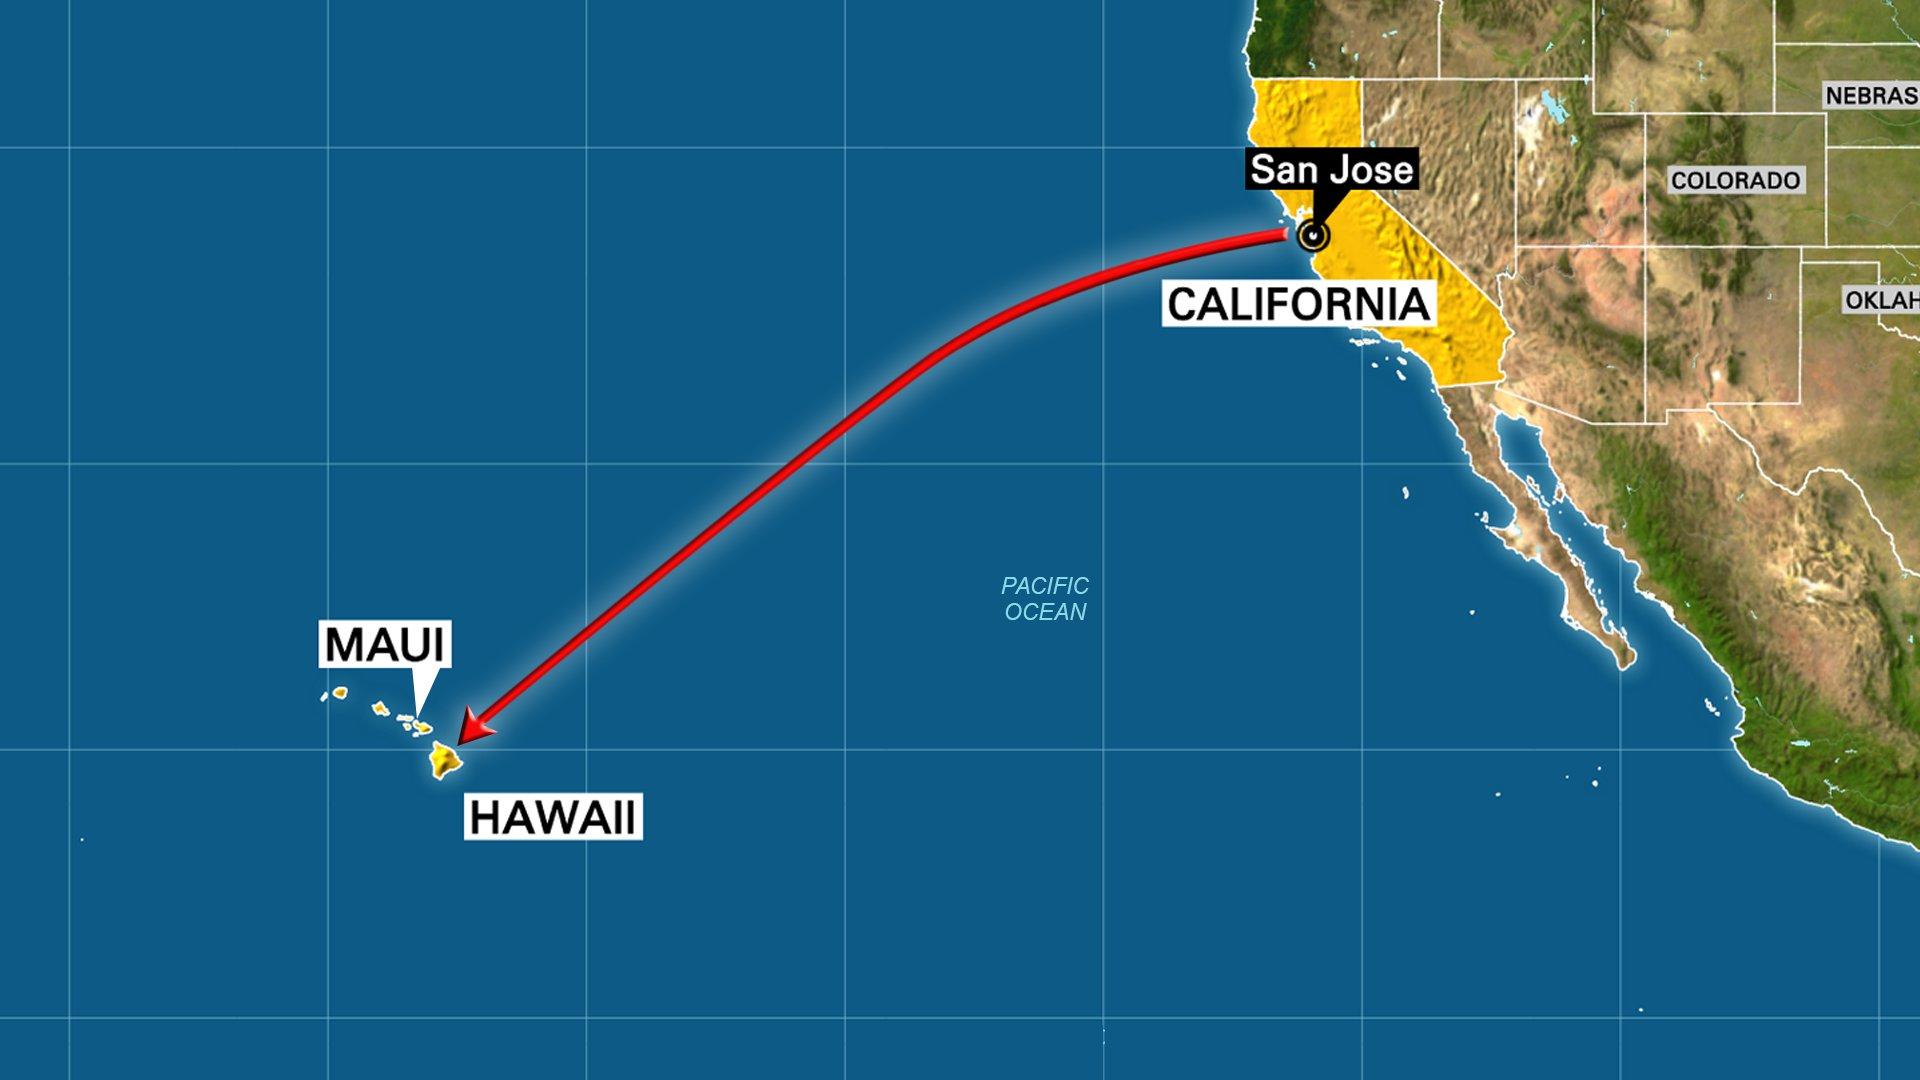 S Map California Map From California To Hawaii - Klipy - Hawaii California Map